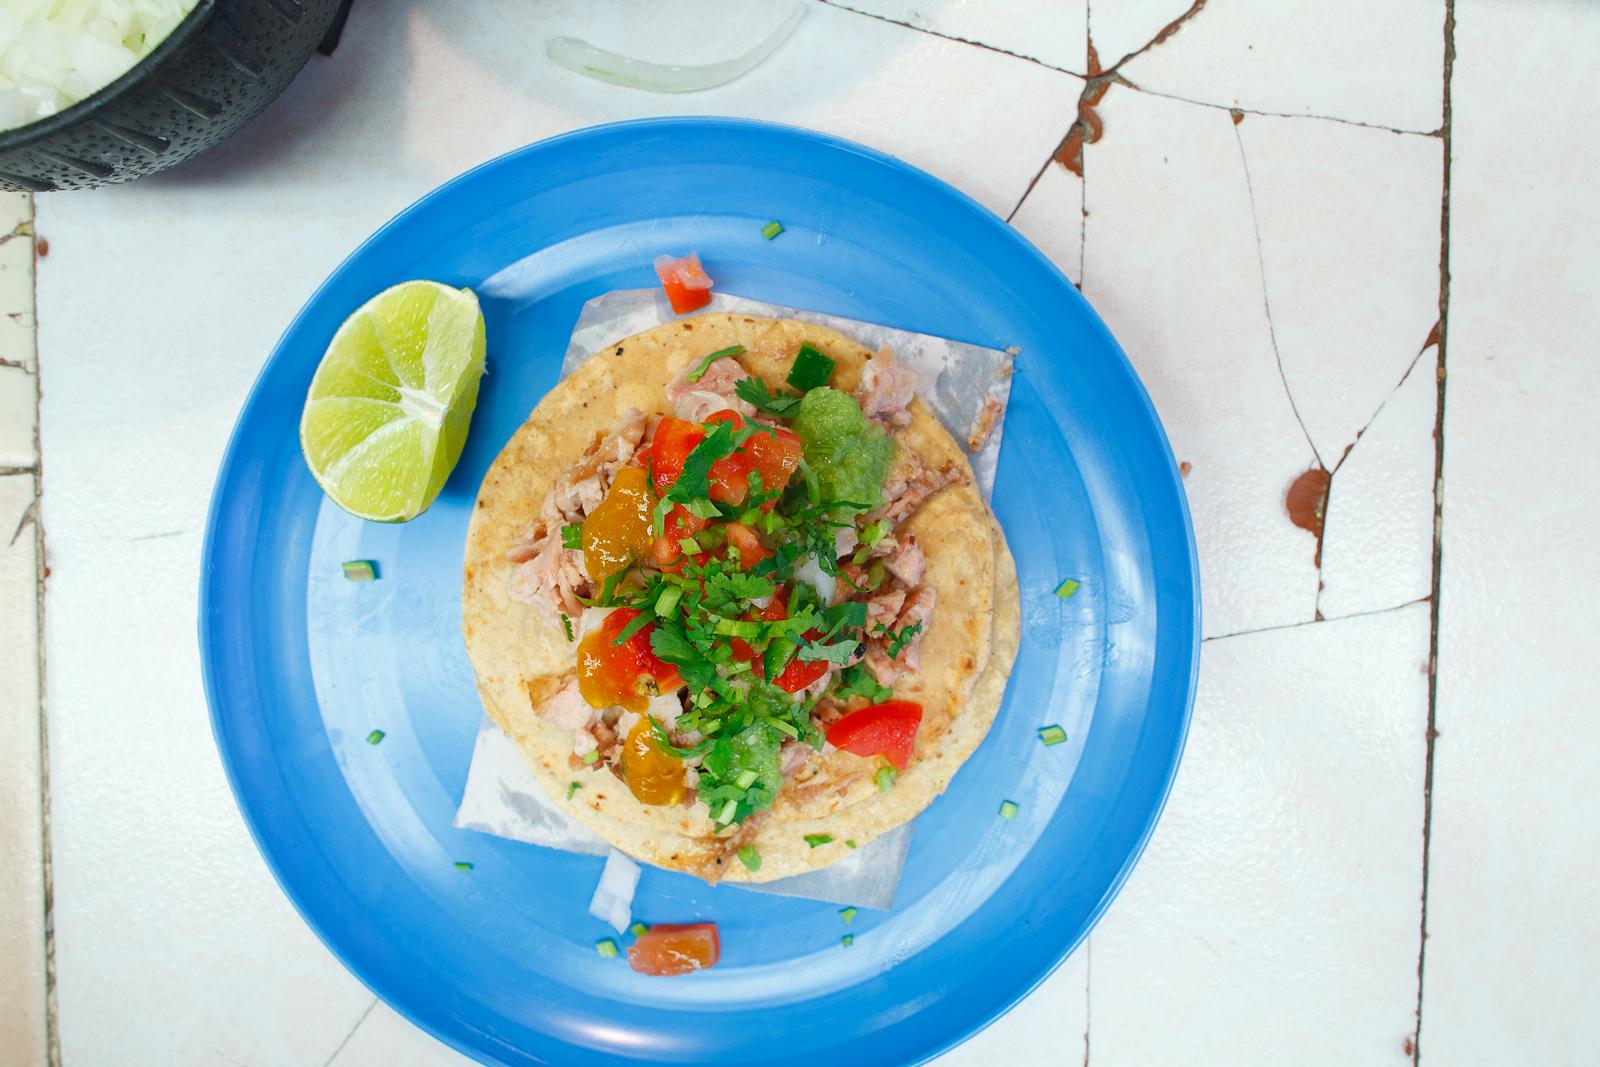 Taco de carnitas (20 MXP)